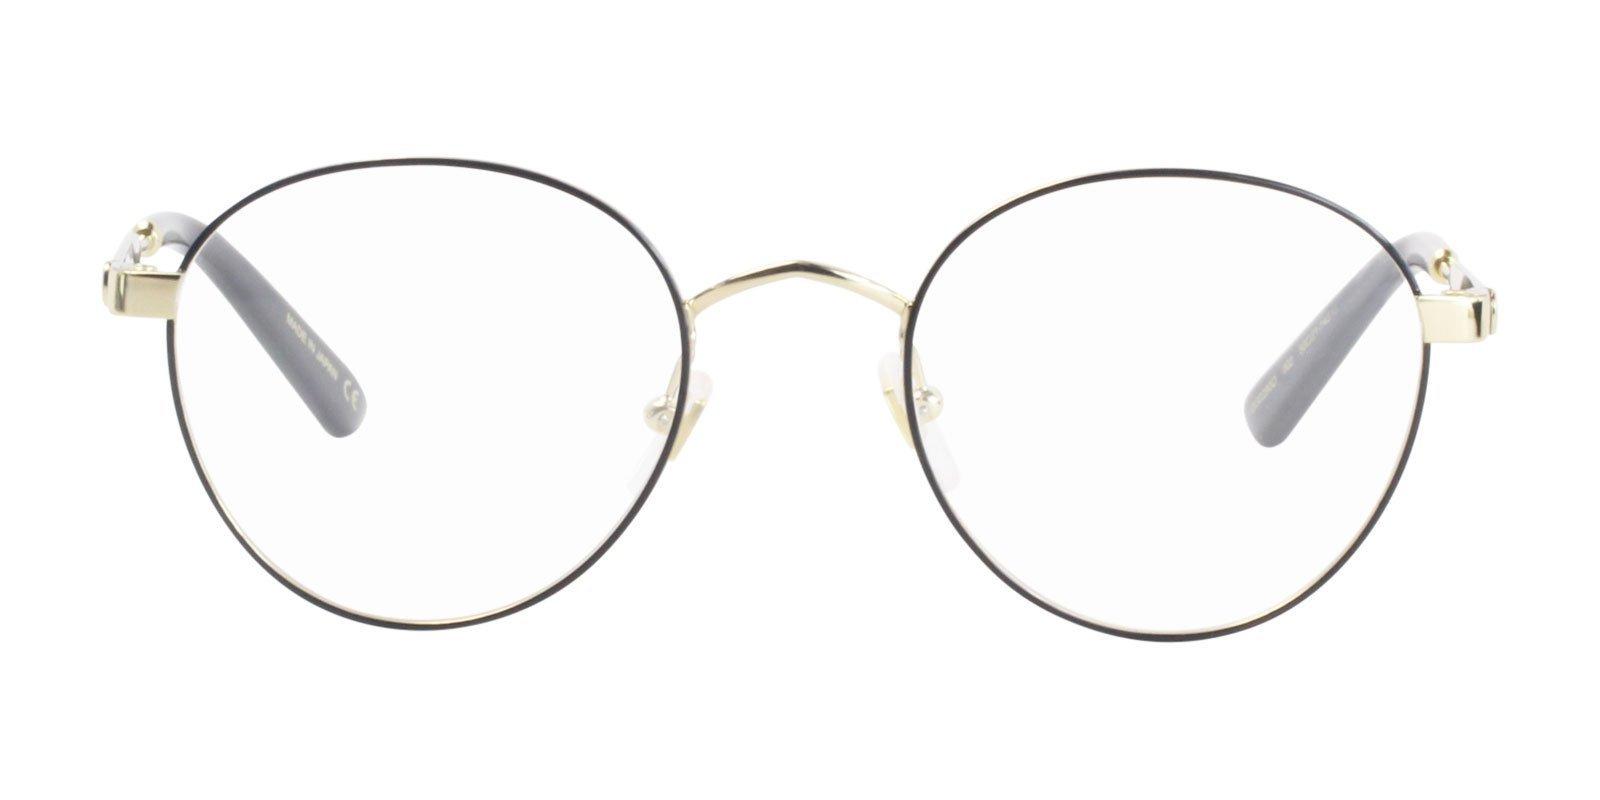 3d66f260947 Gucci - GG0290O 002 eyeglasses